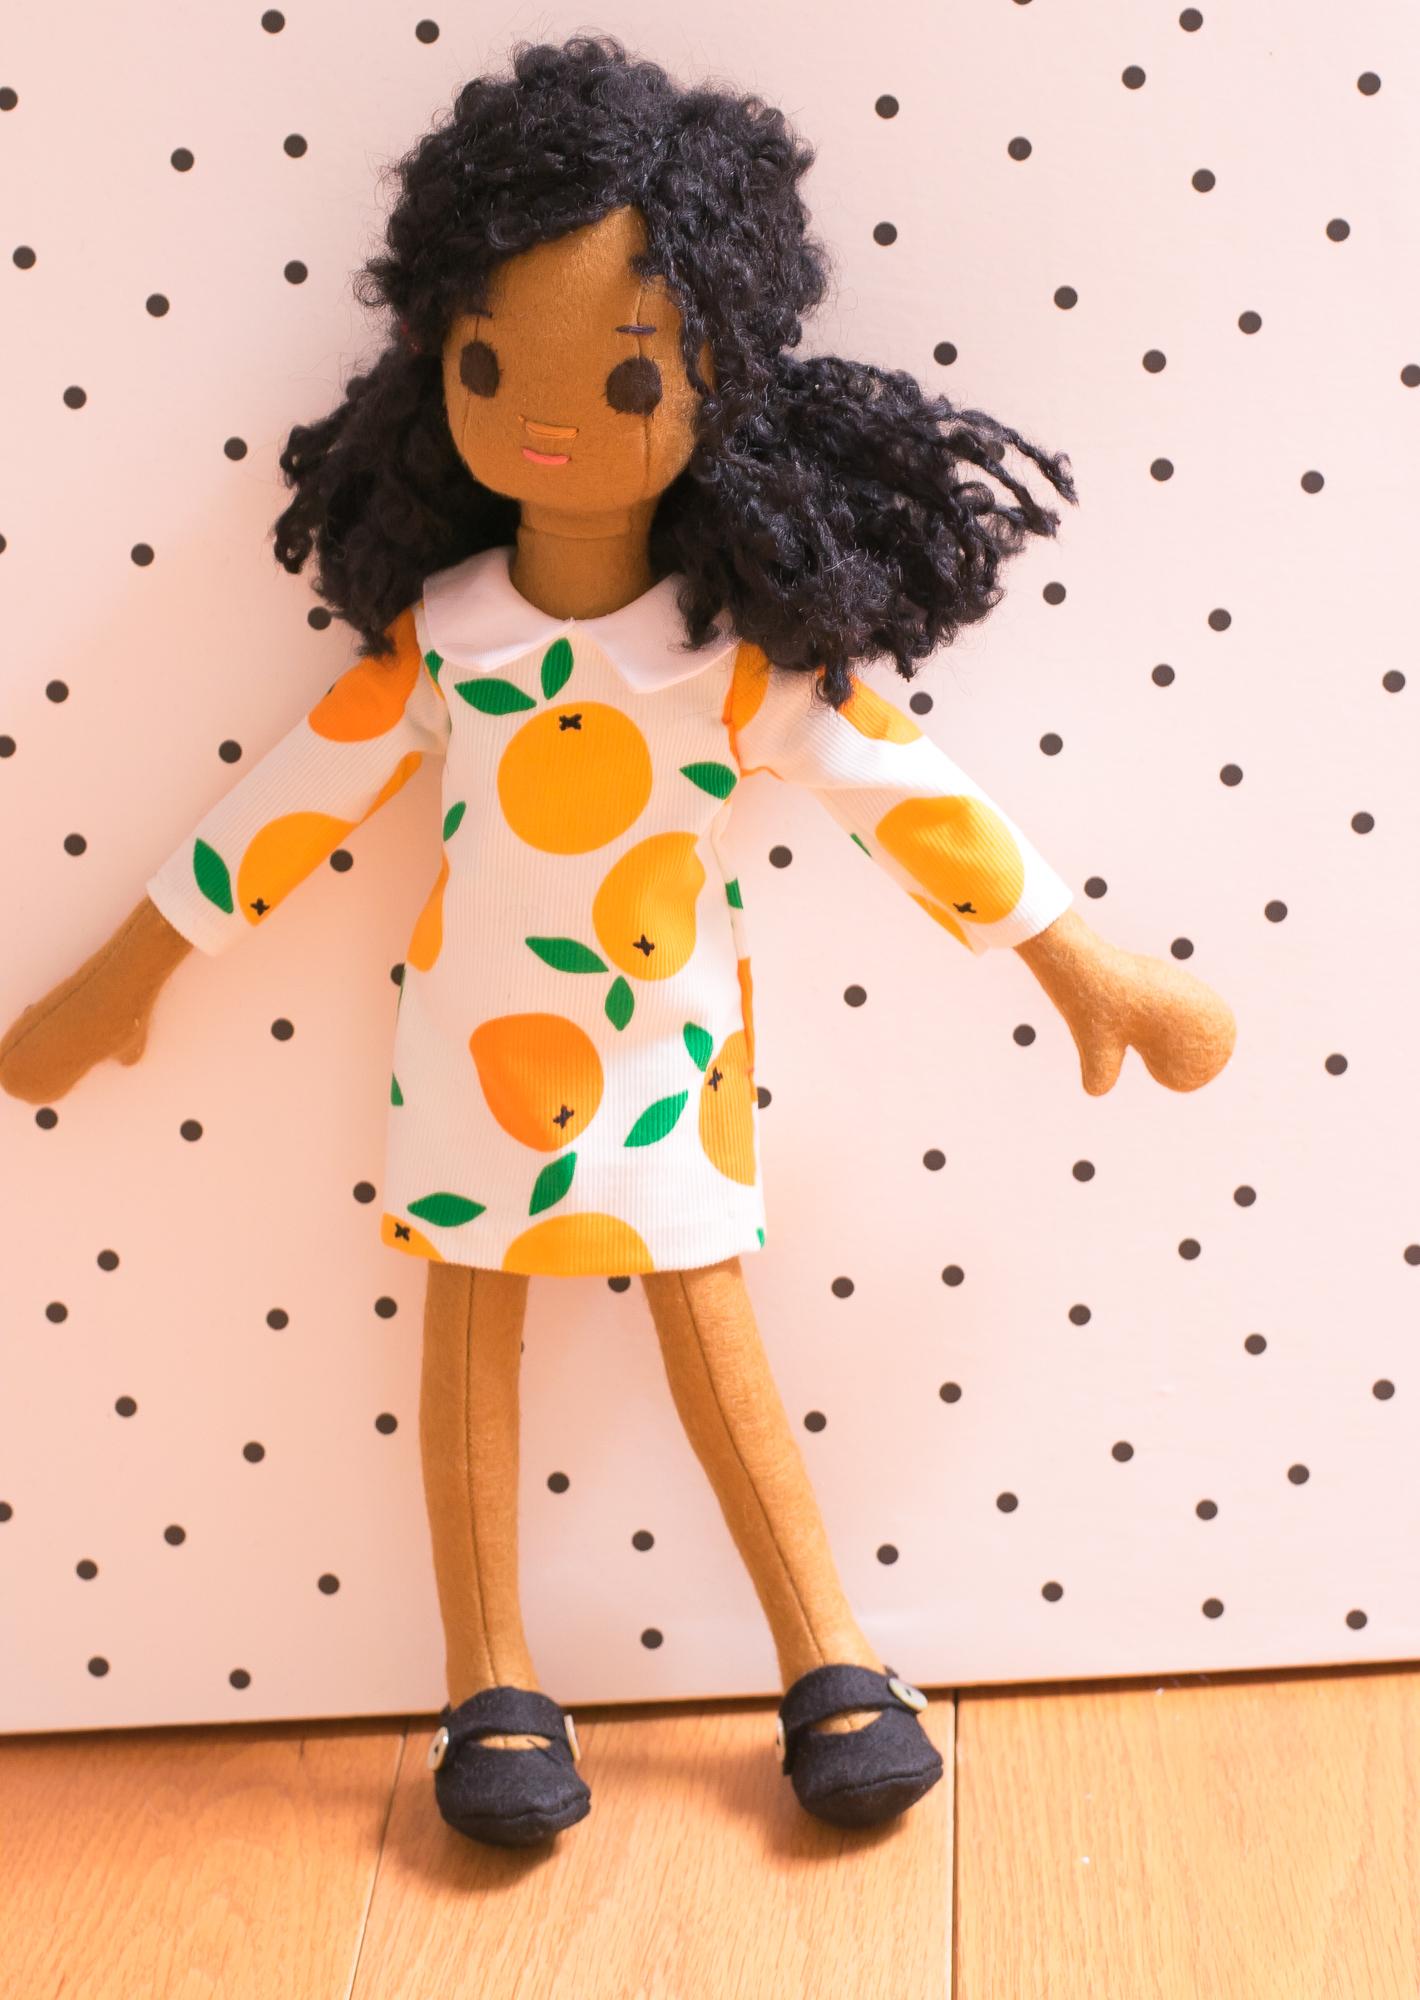 Gallery of Dolls-6.jpg